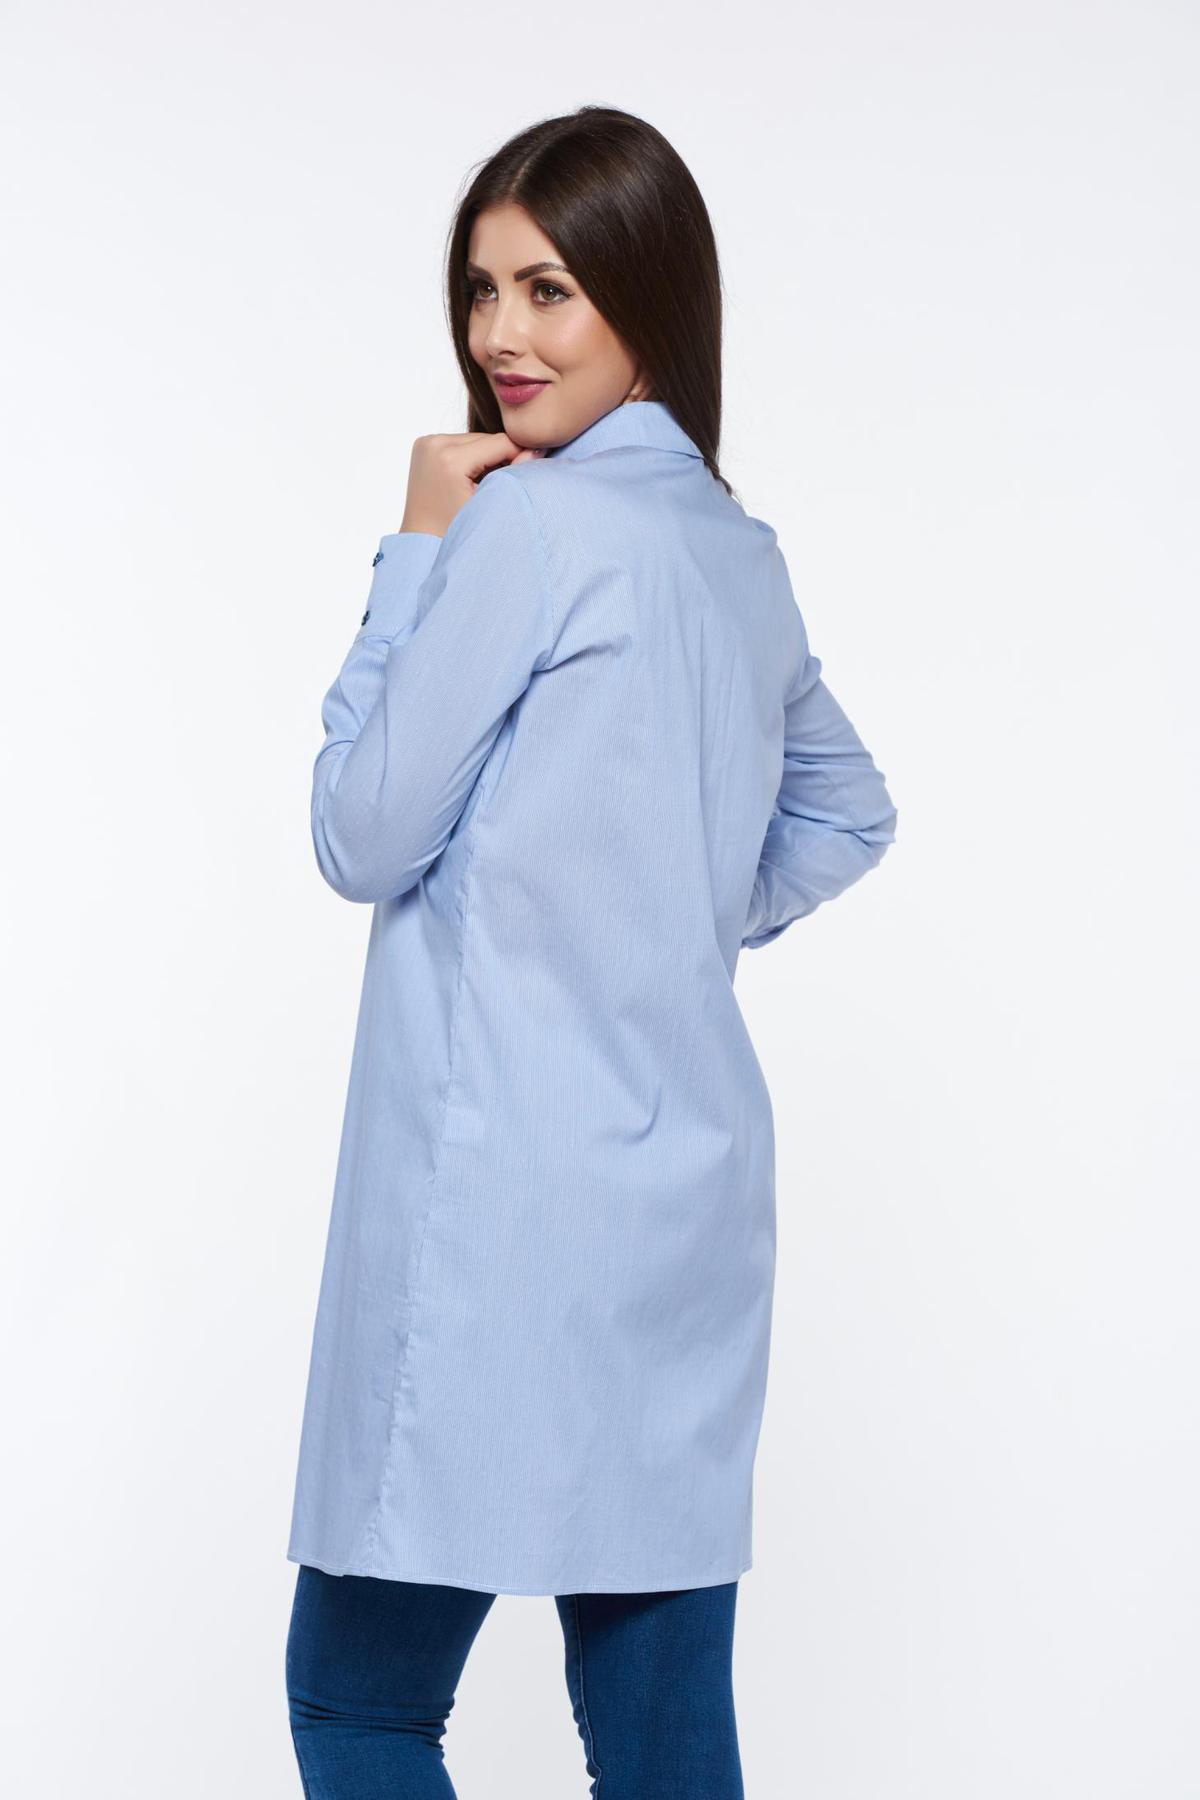 Camasa dama PrettyGirl albastra-deschis office lunga cu croi larg din bumbac accesorizata cu fundite